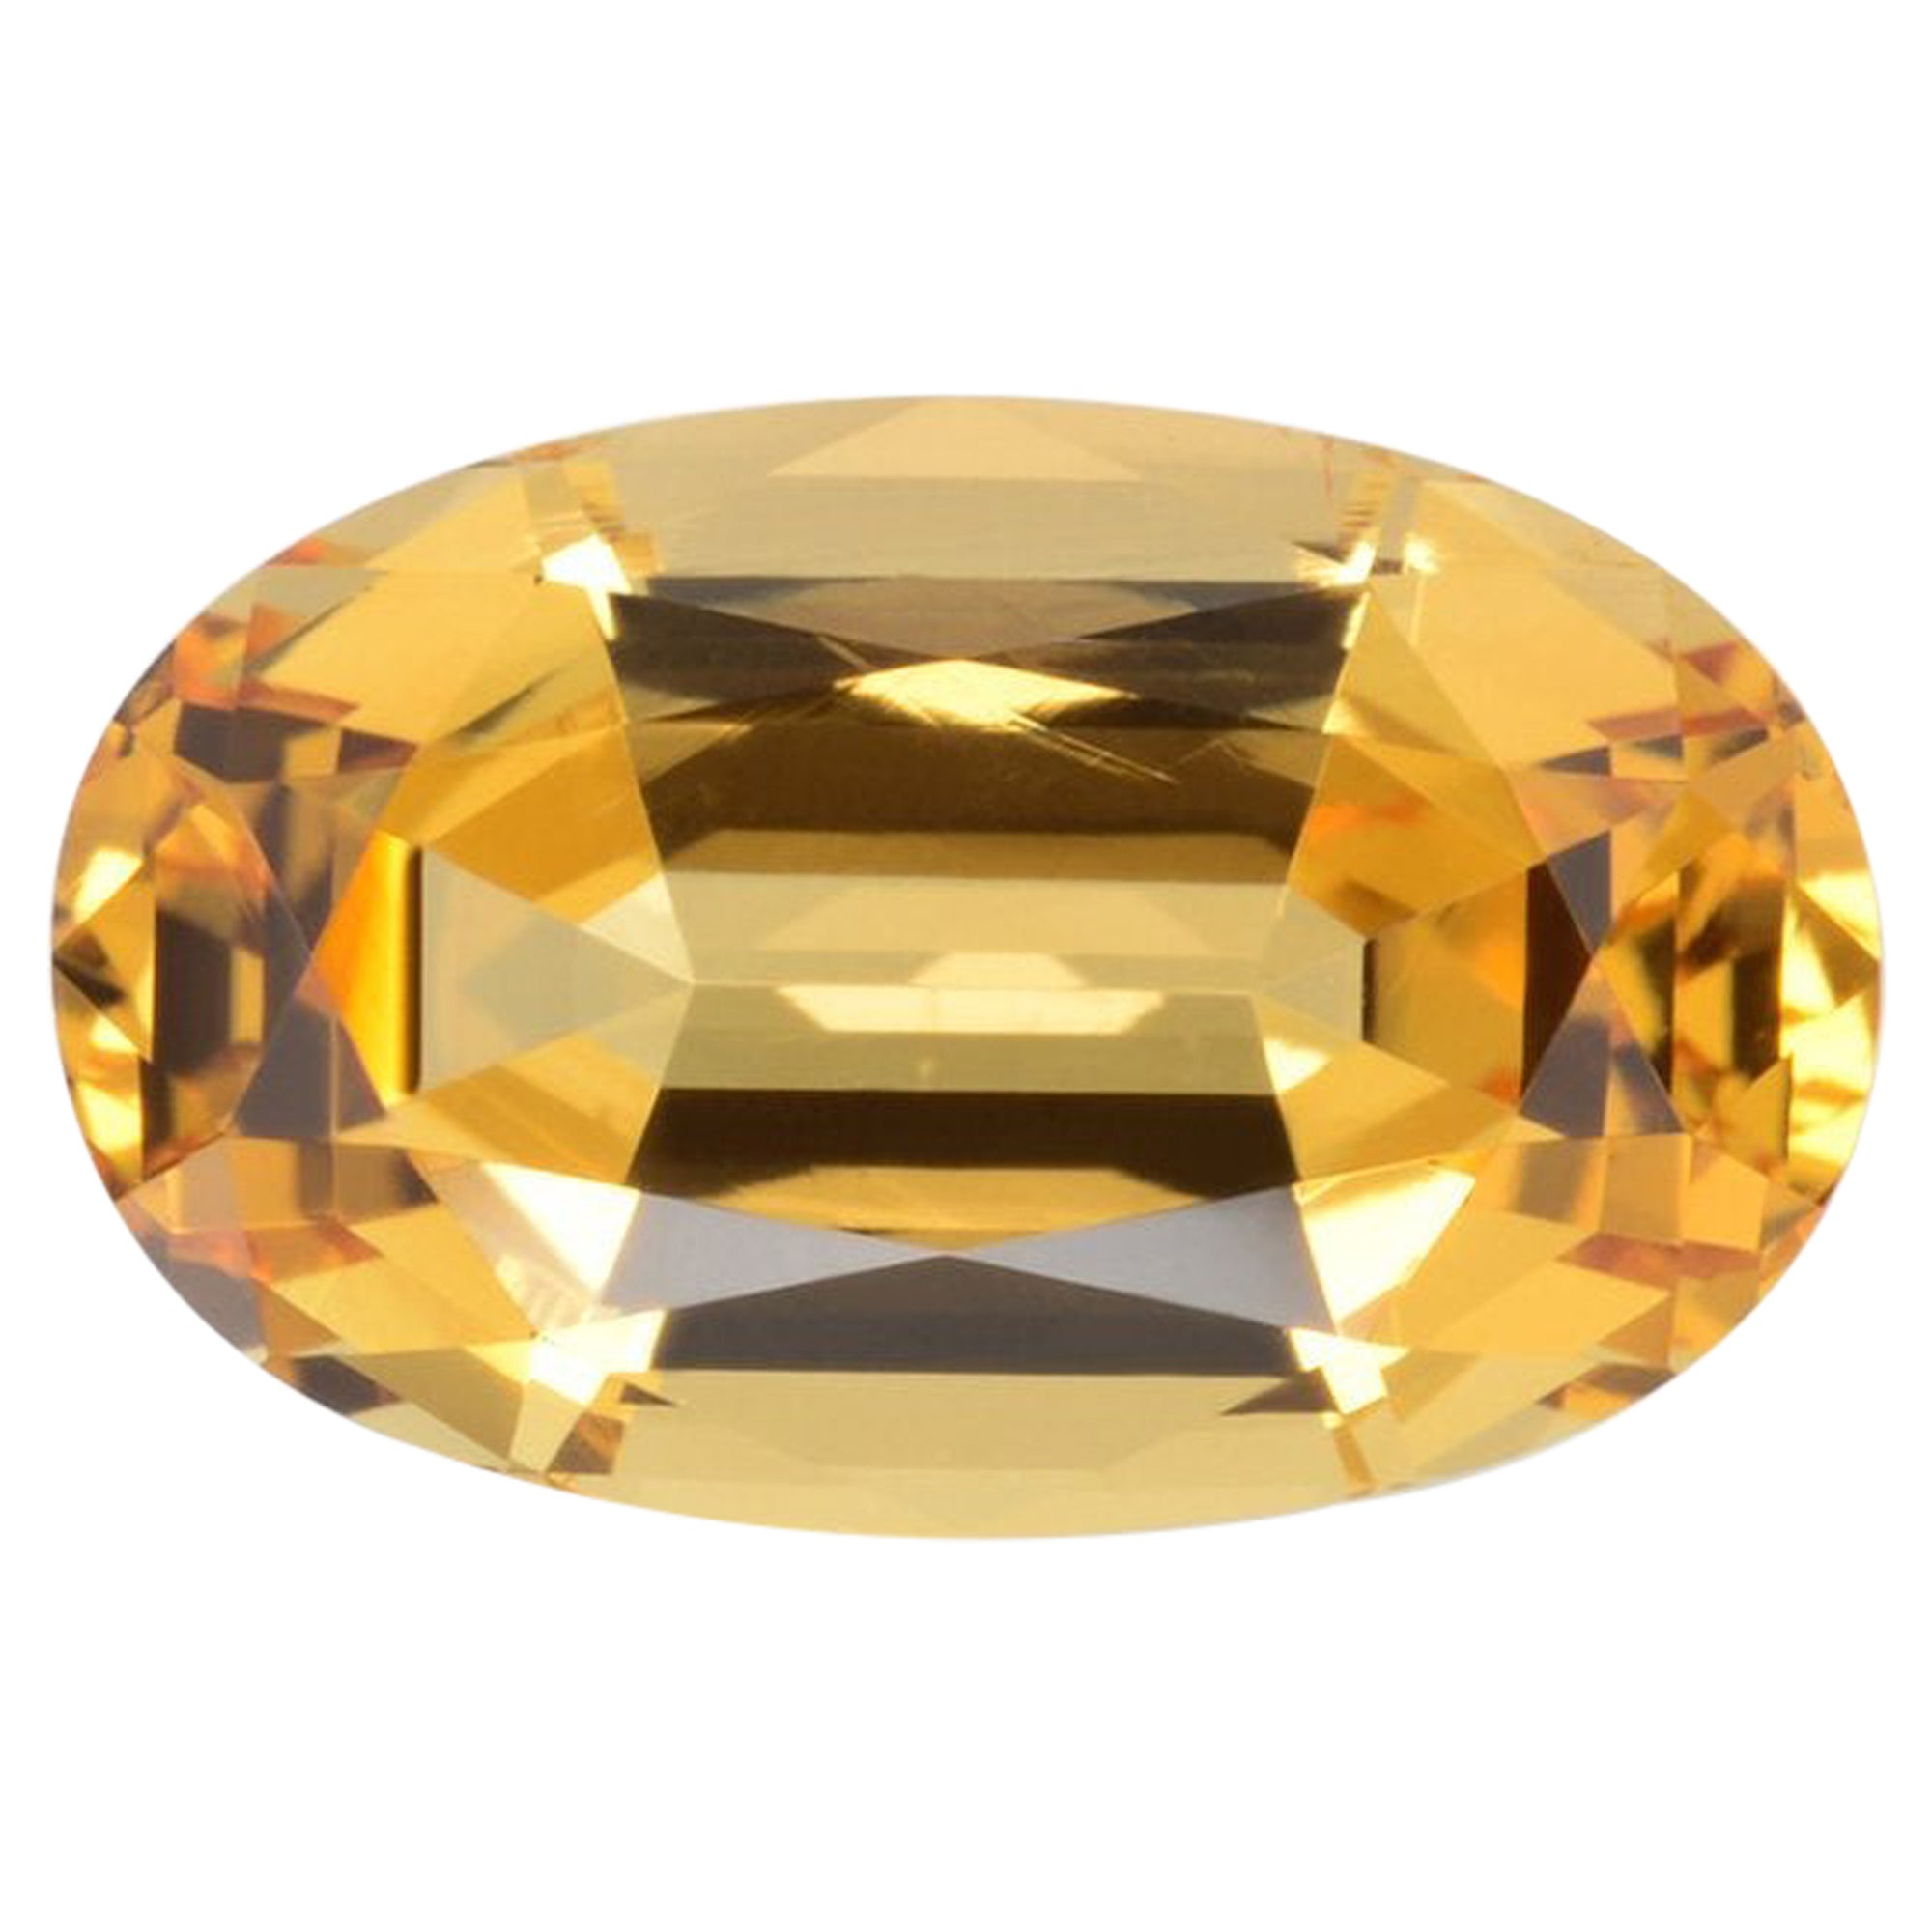 Imperial Topaz Ring Gem 4.20 Carat Unset Loose Gemstone